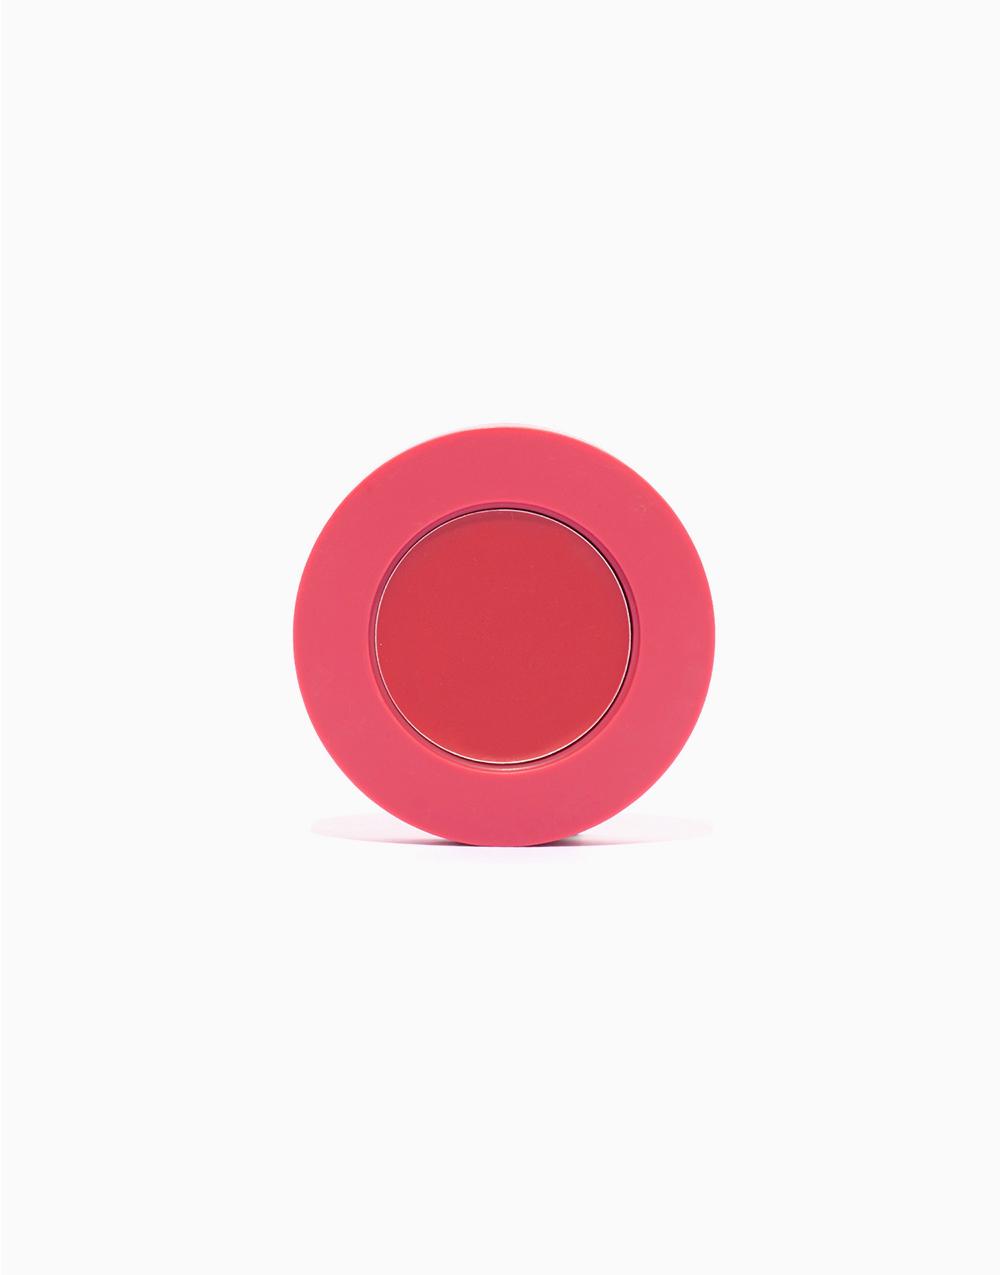 Face Stack Multi Pot Single Pan by BLK Cosmetics | Staycation